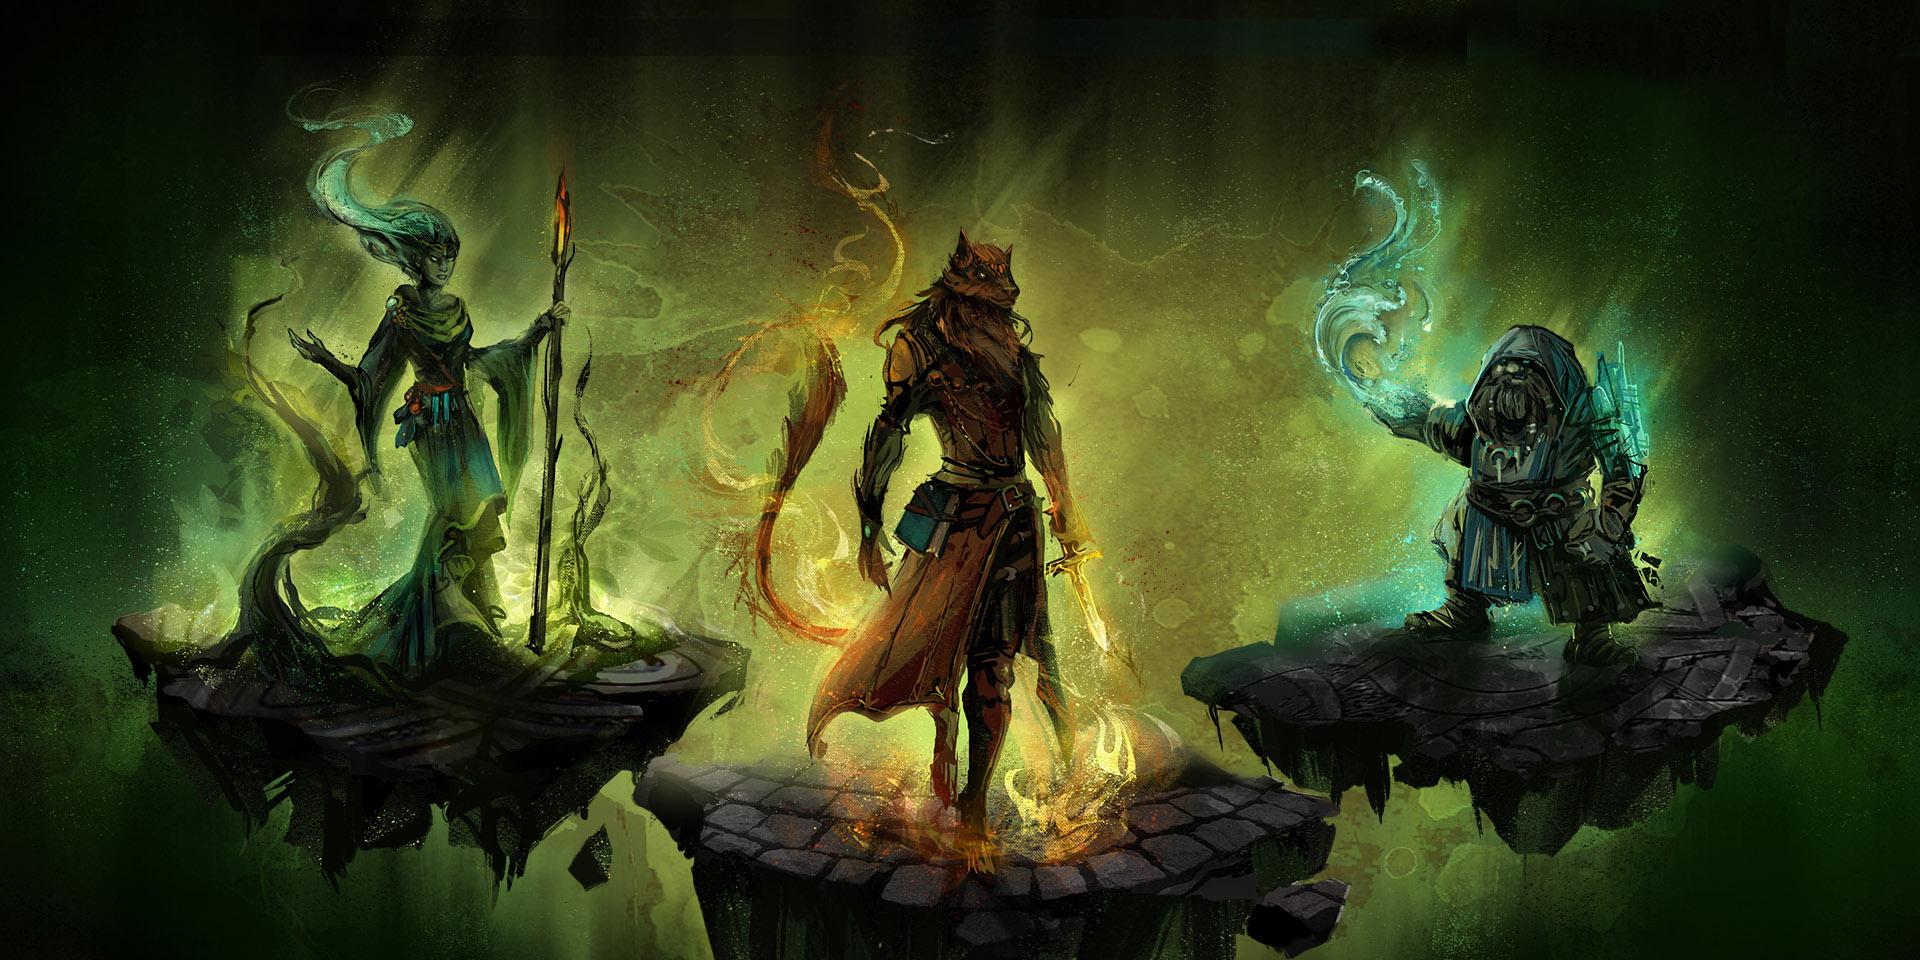 Camelot Unchained: Магия Расколотого Камелота в деталях: Druid, Flame Warden, Wave Weaver